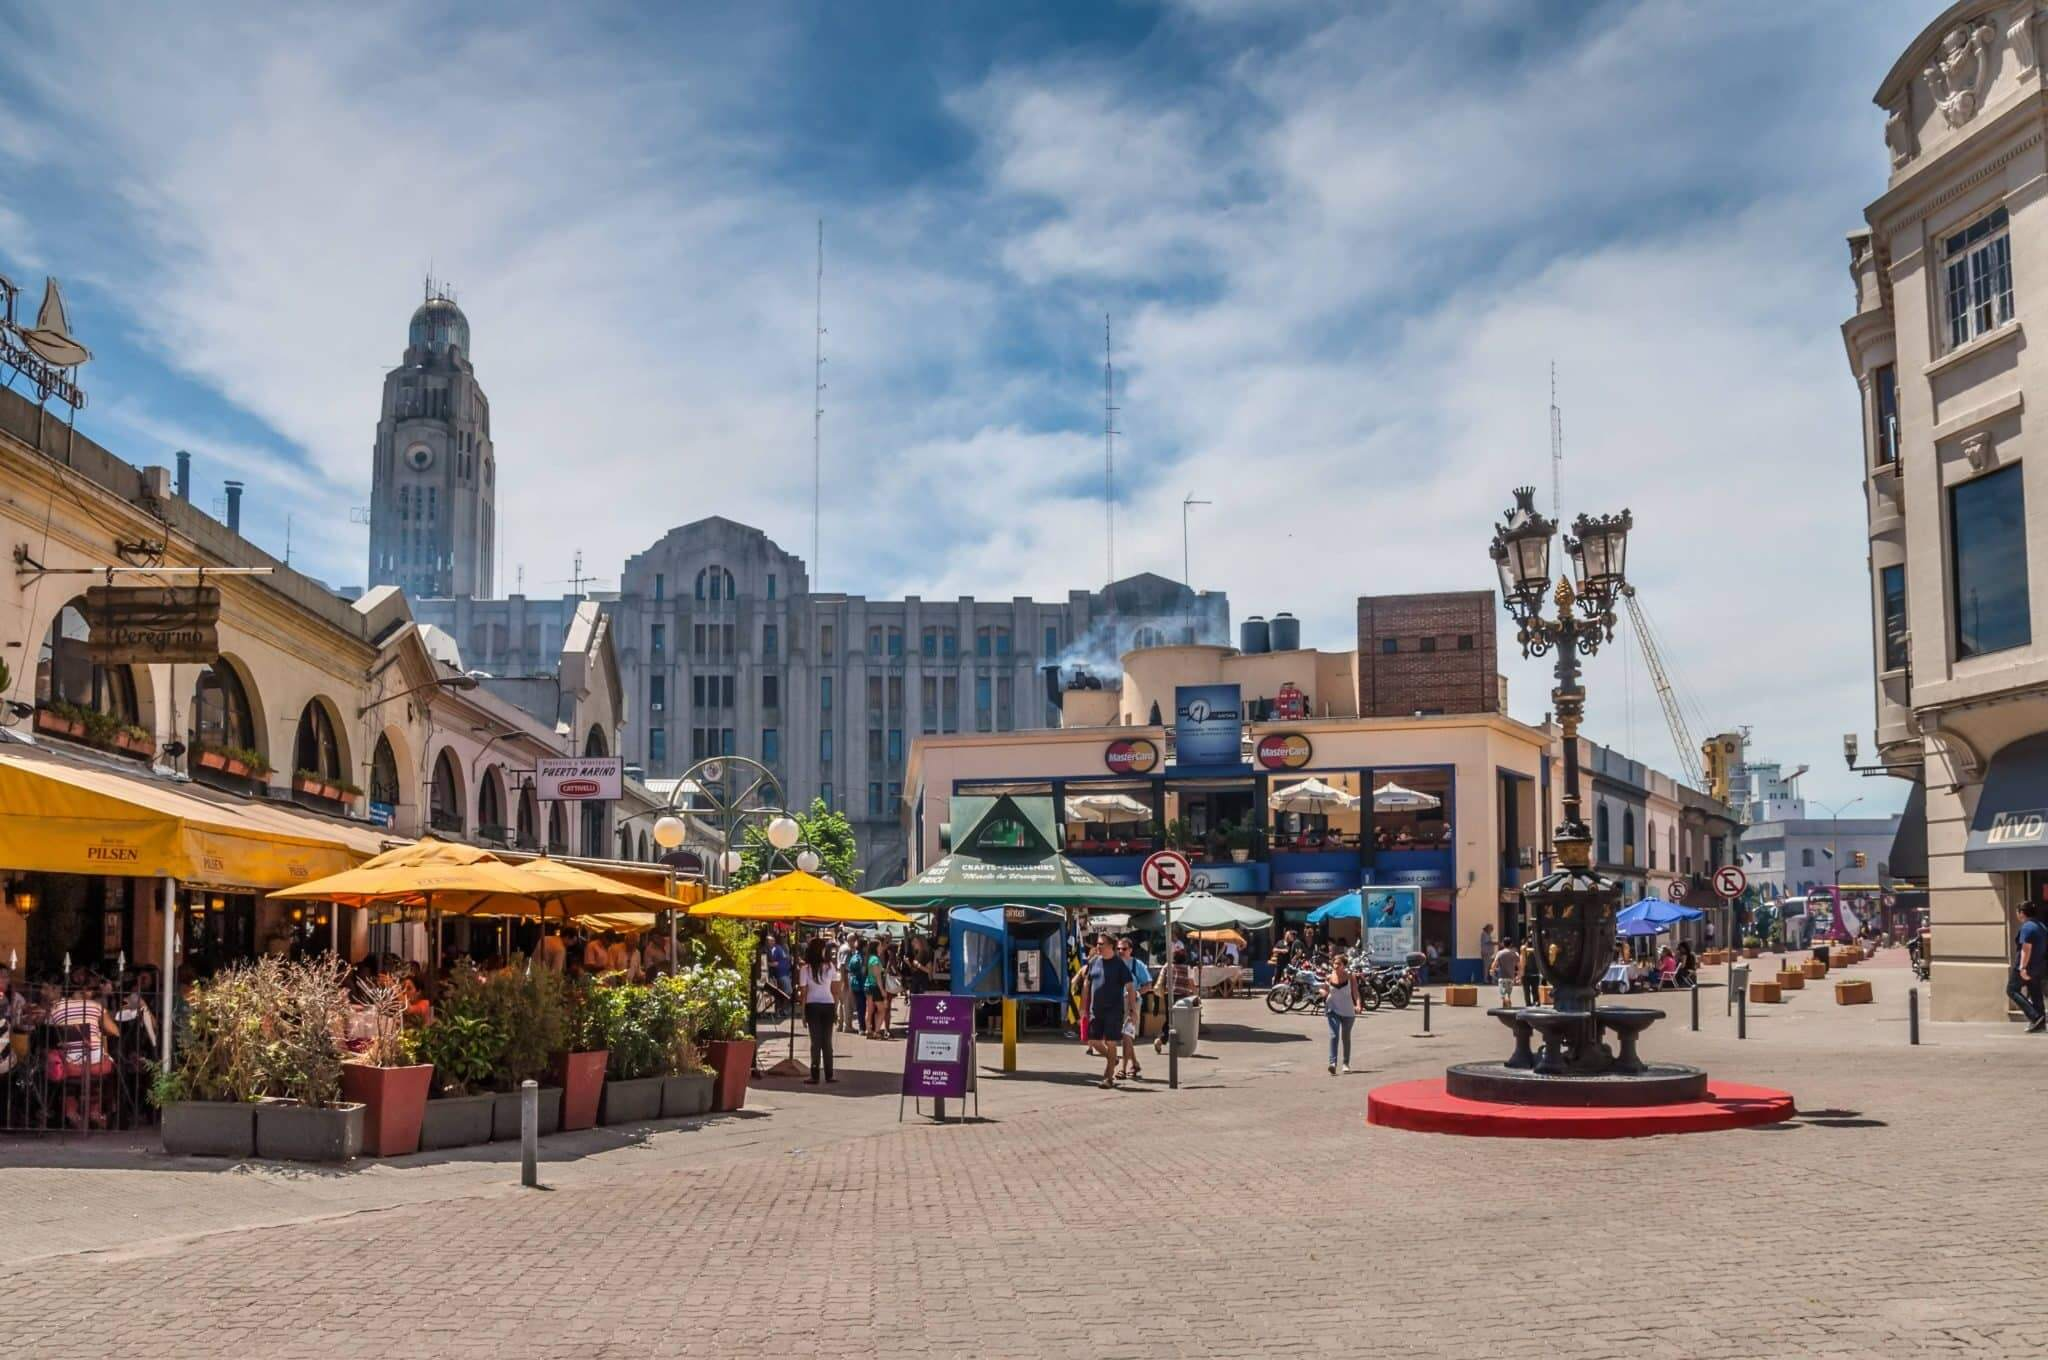 Roteiro de 5 dias no Uruguai: Mercado del Puerto